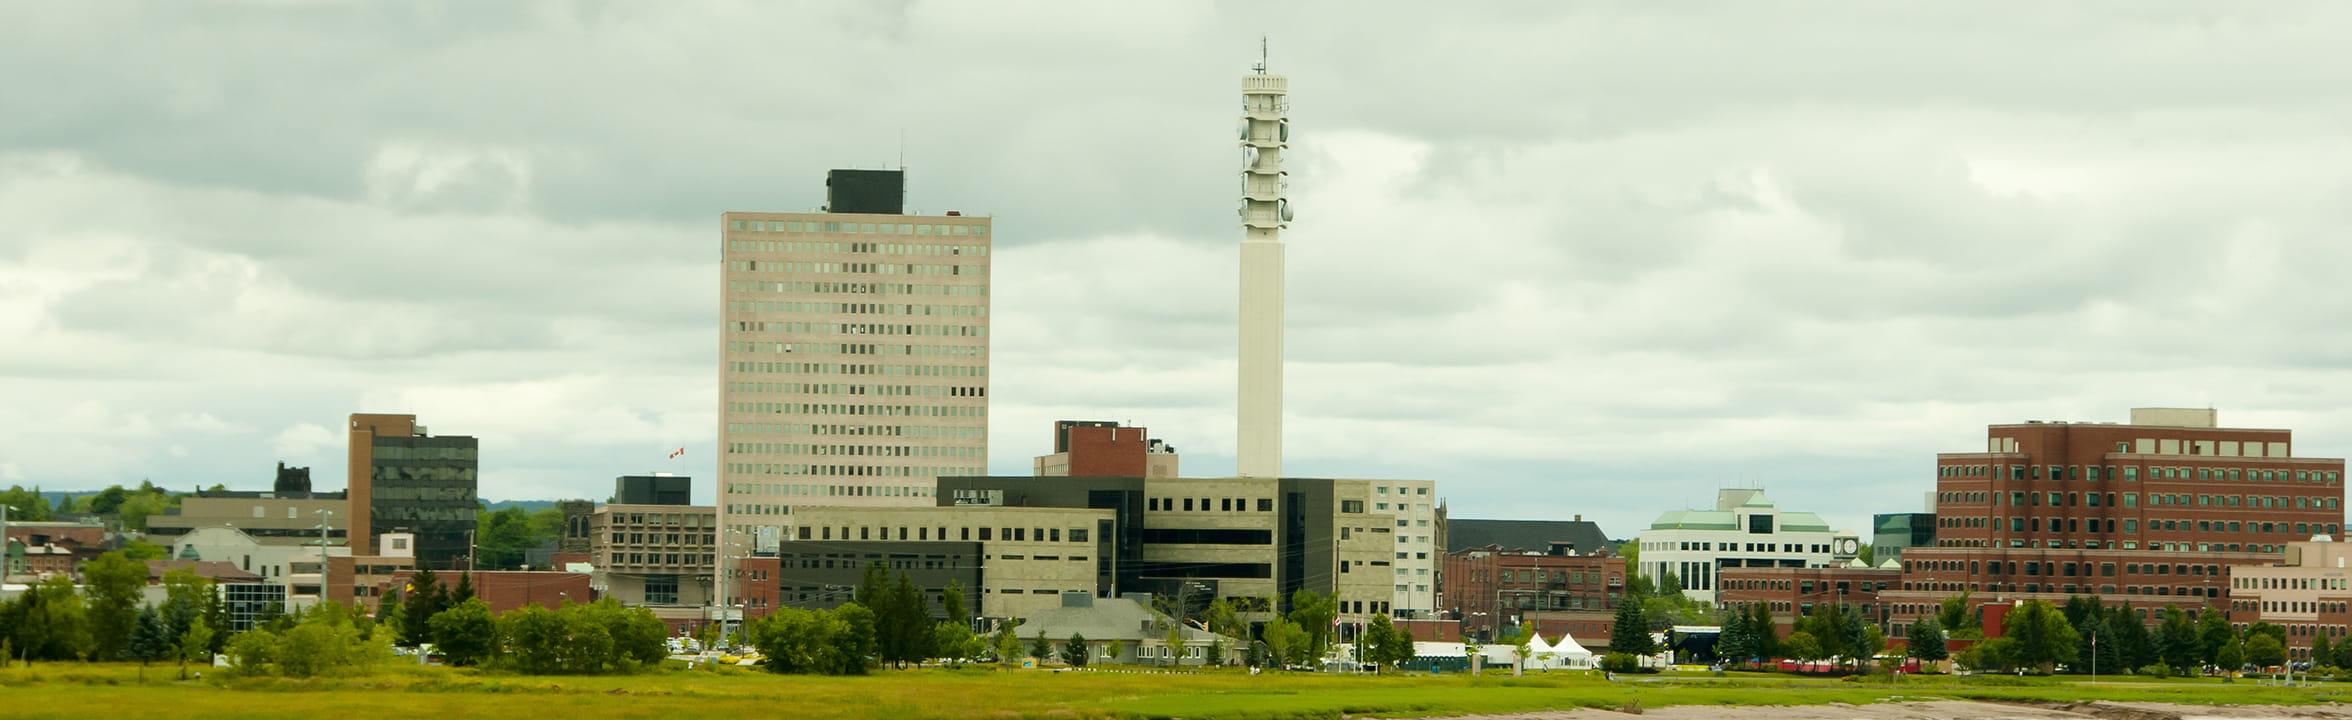 Moncton, New Brunswick, Canada